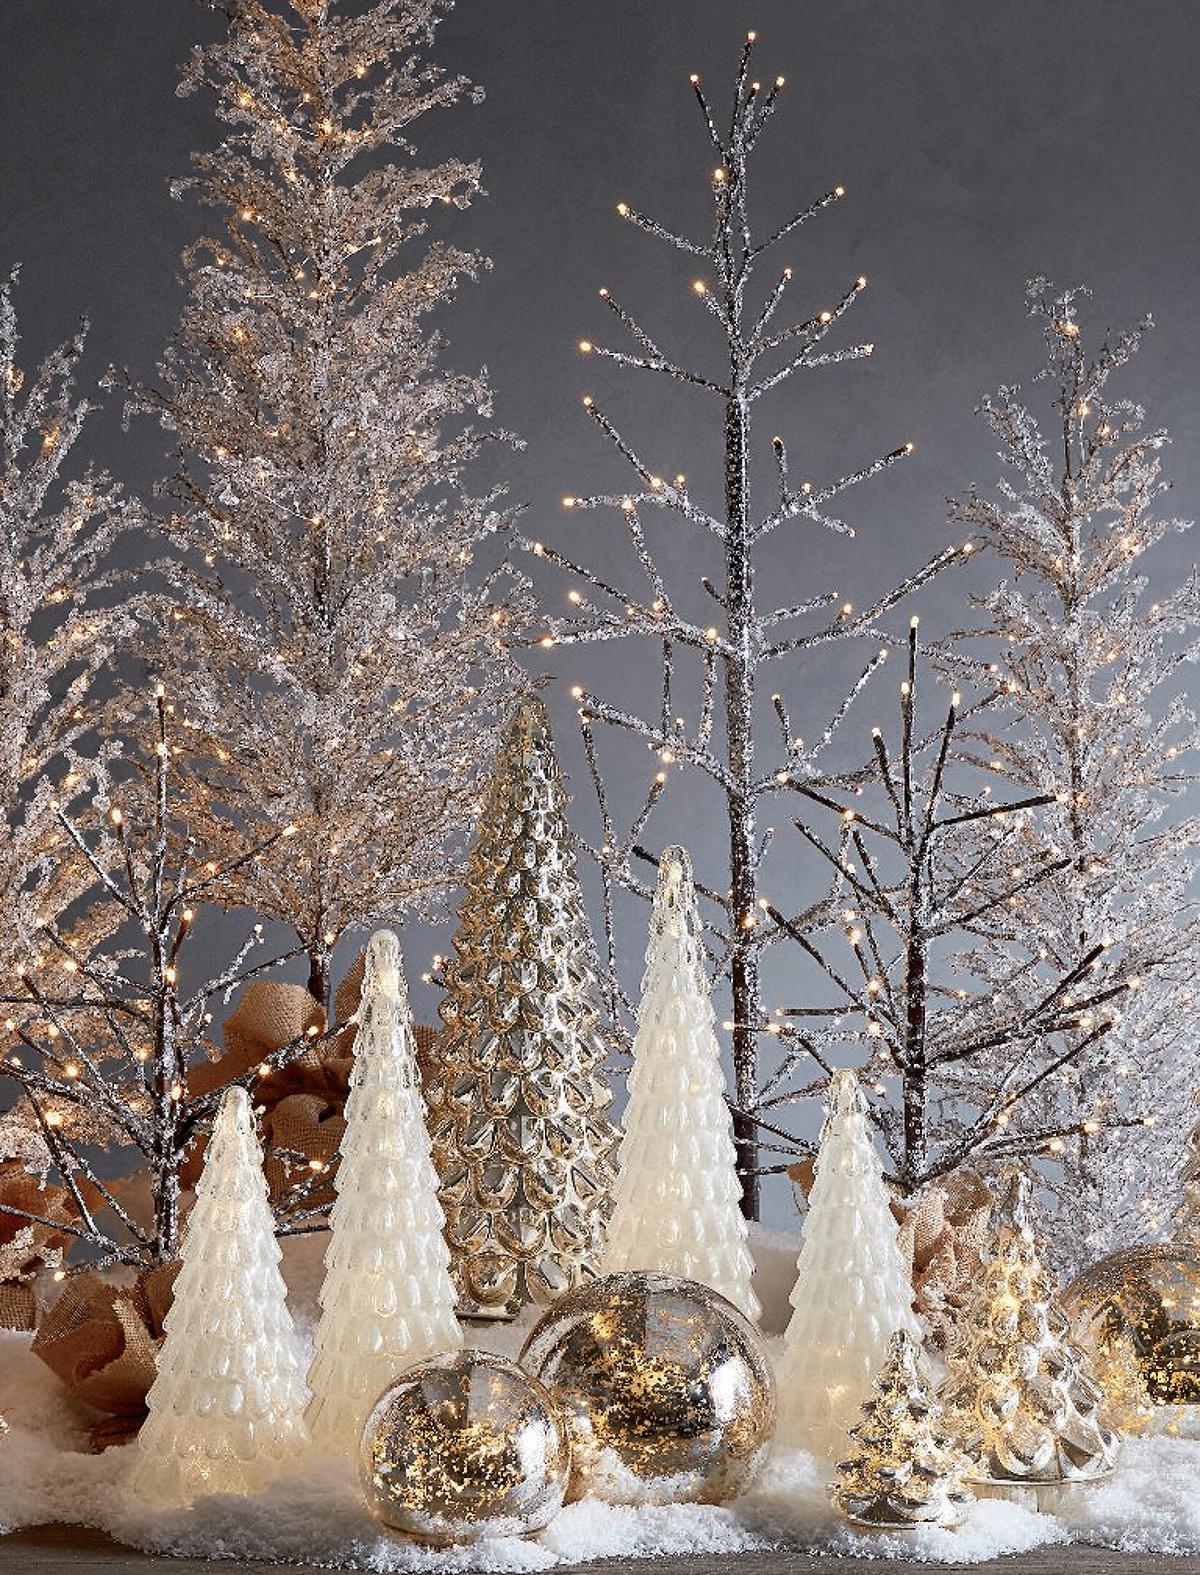 Frosty Christmas Home Decor